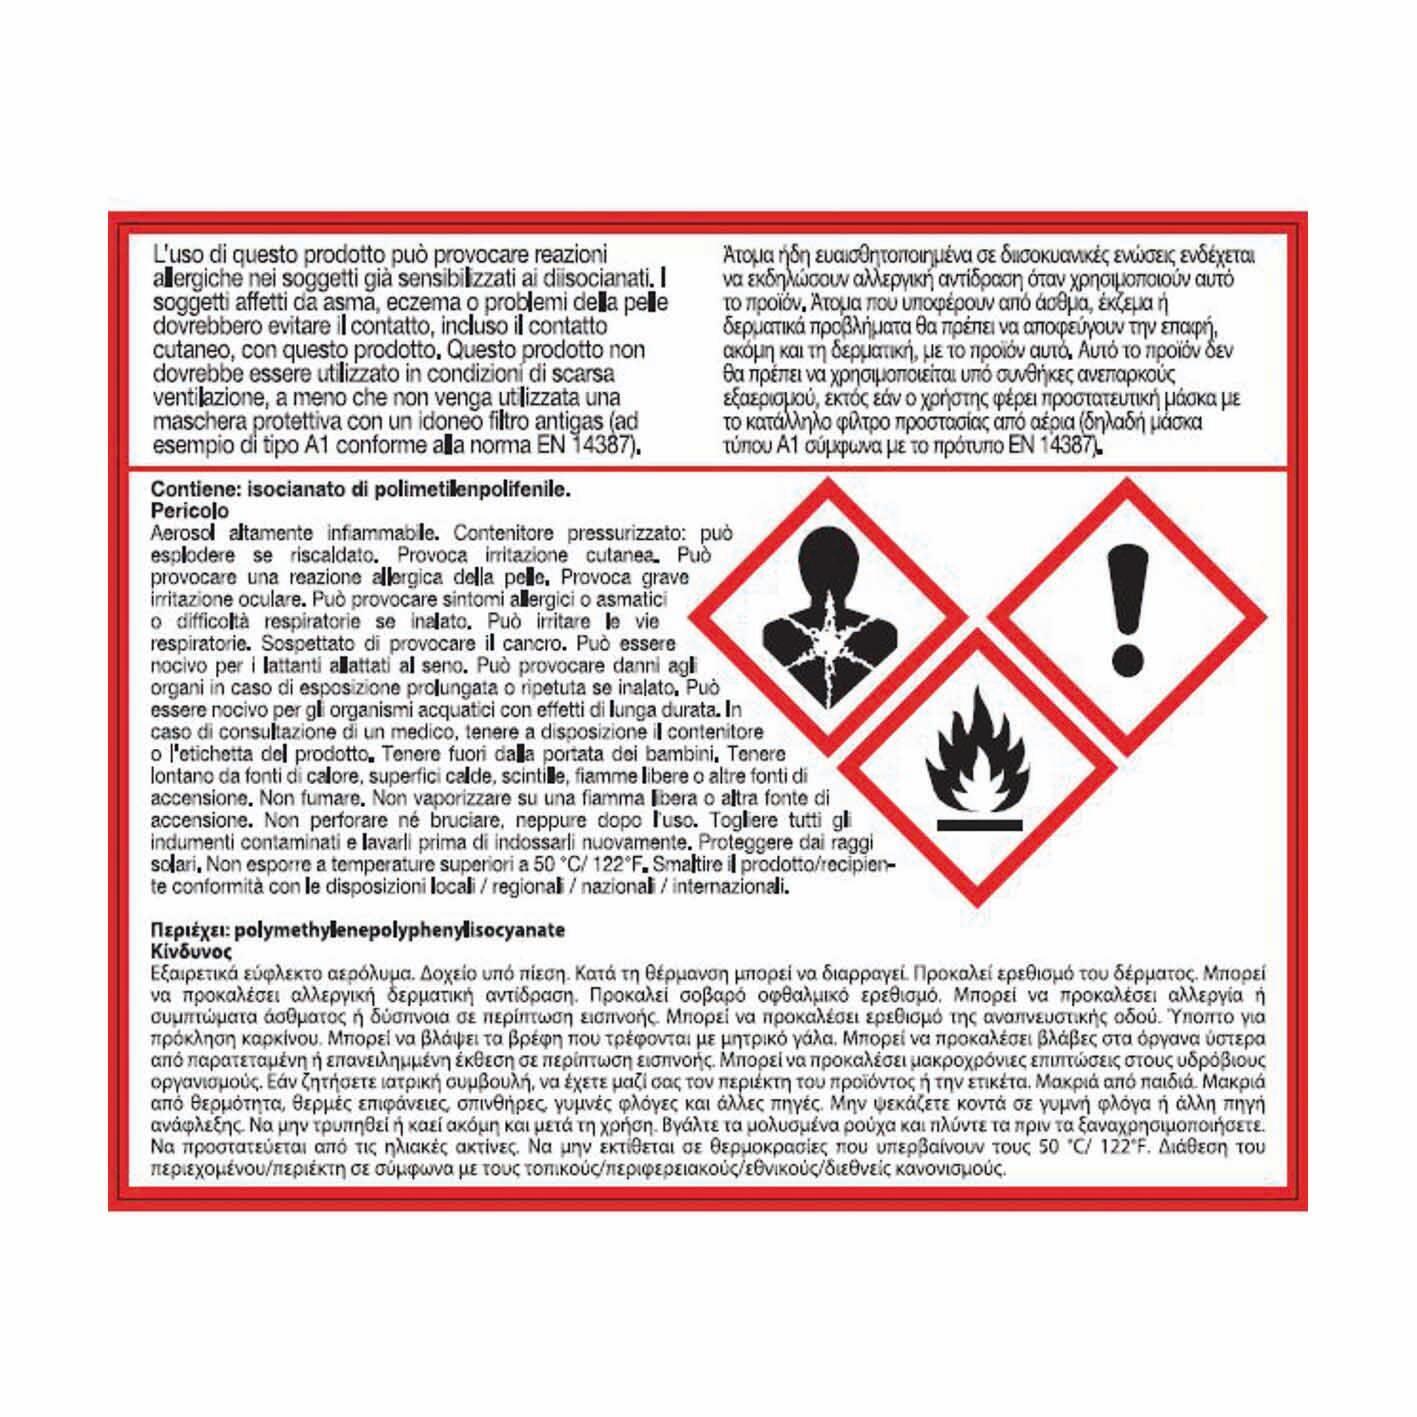 Schiuma espansa poliuretanica AXTON bianco per porta 0,75 ml - 2